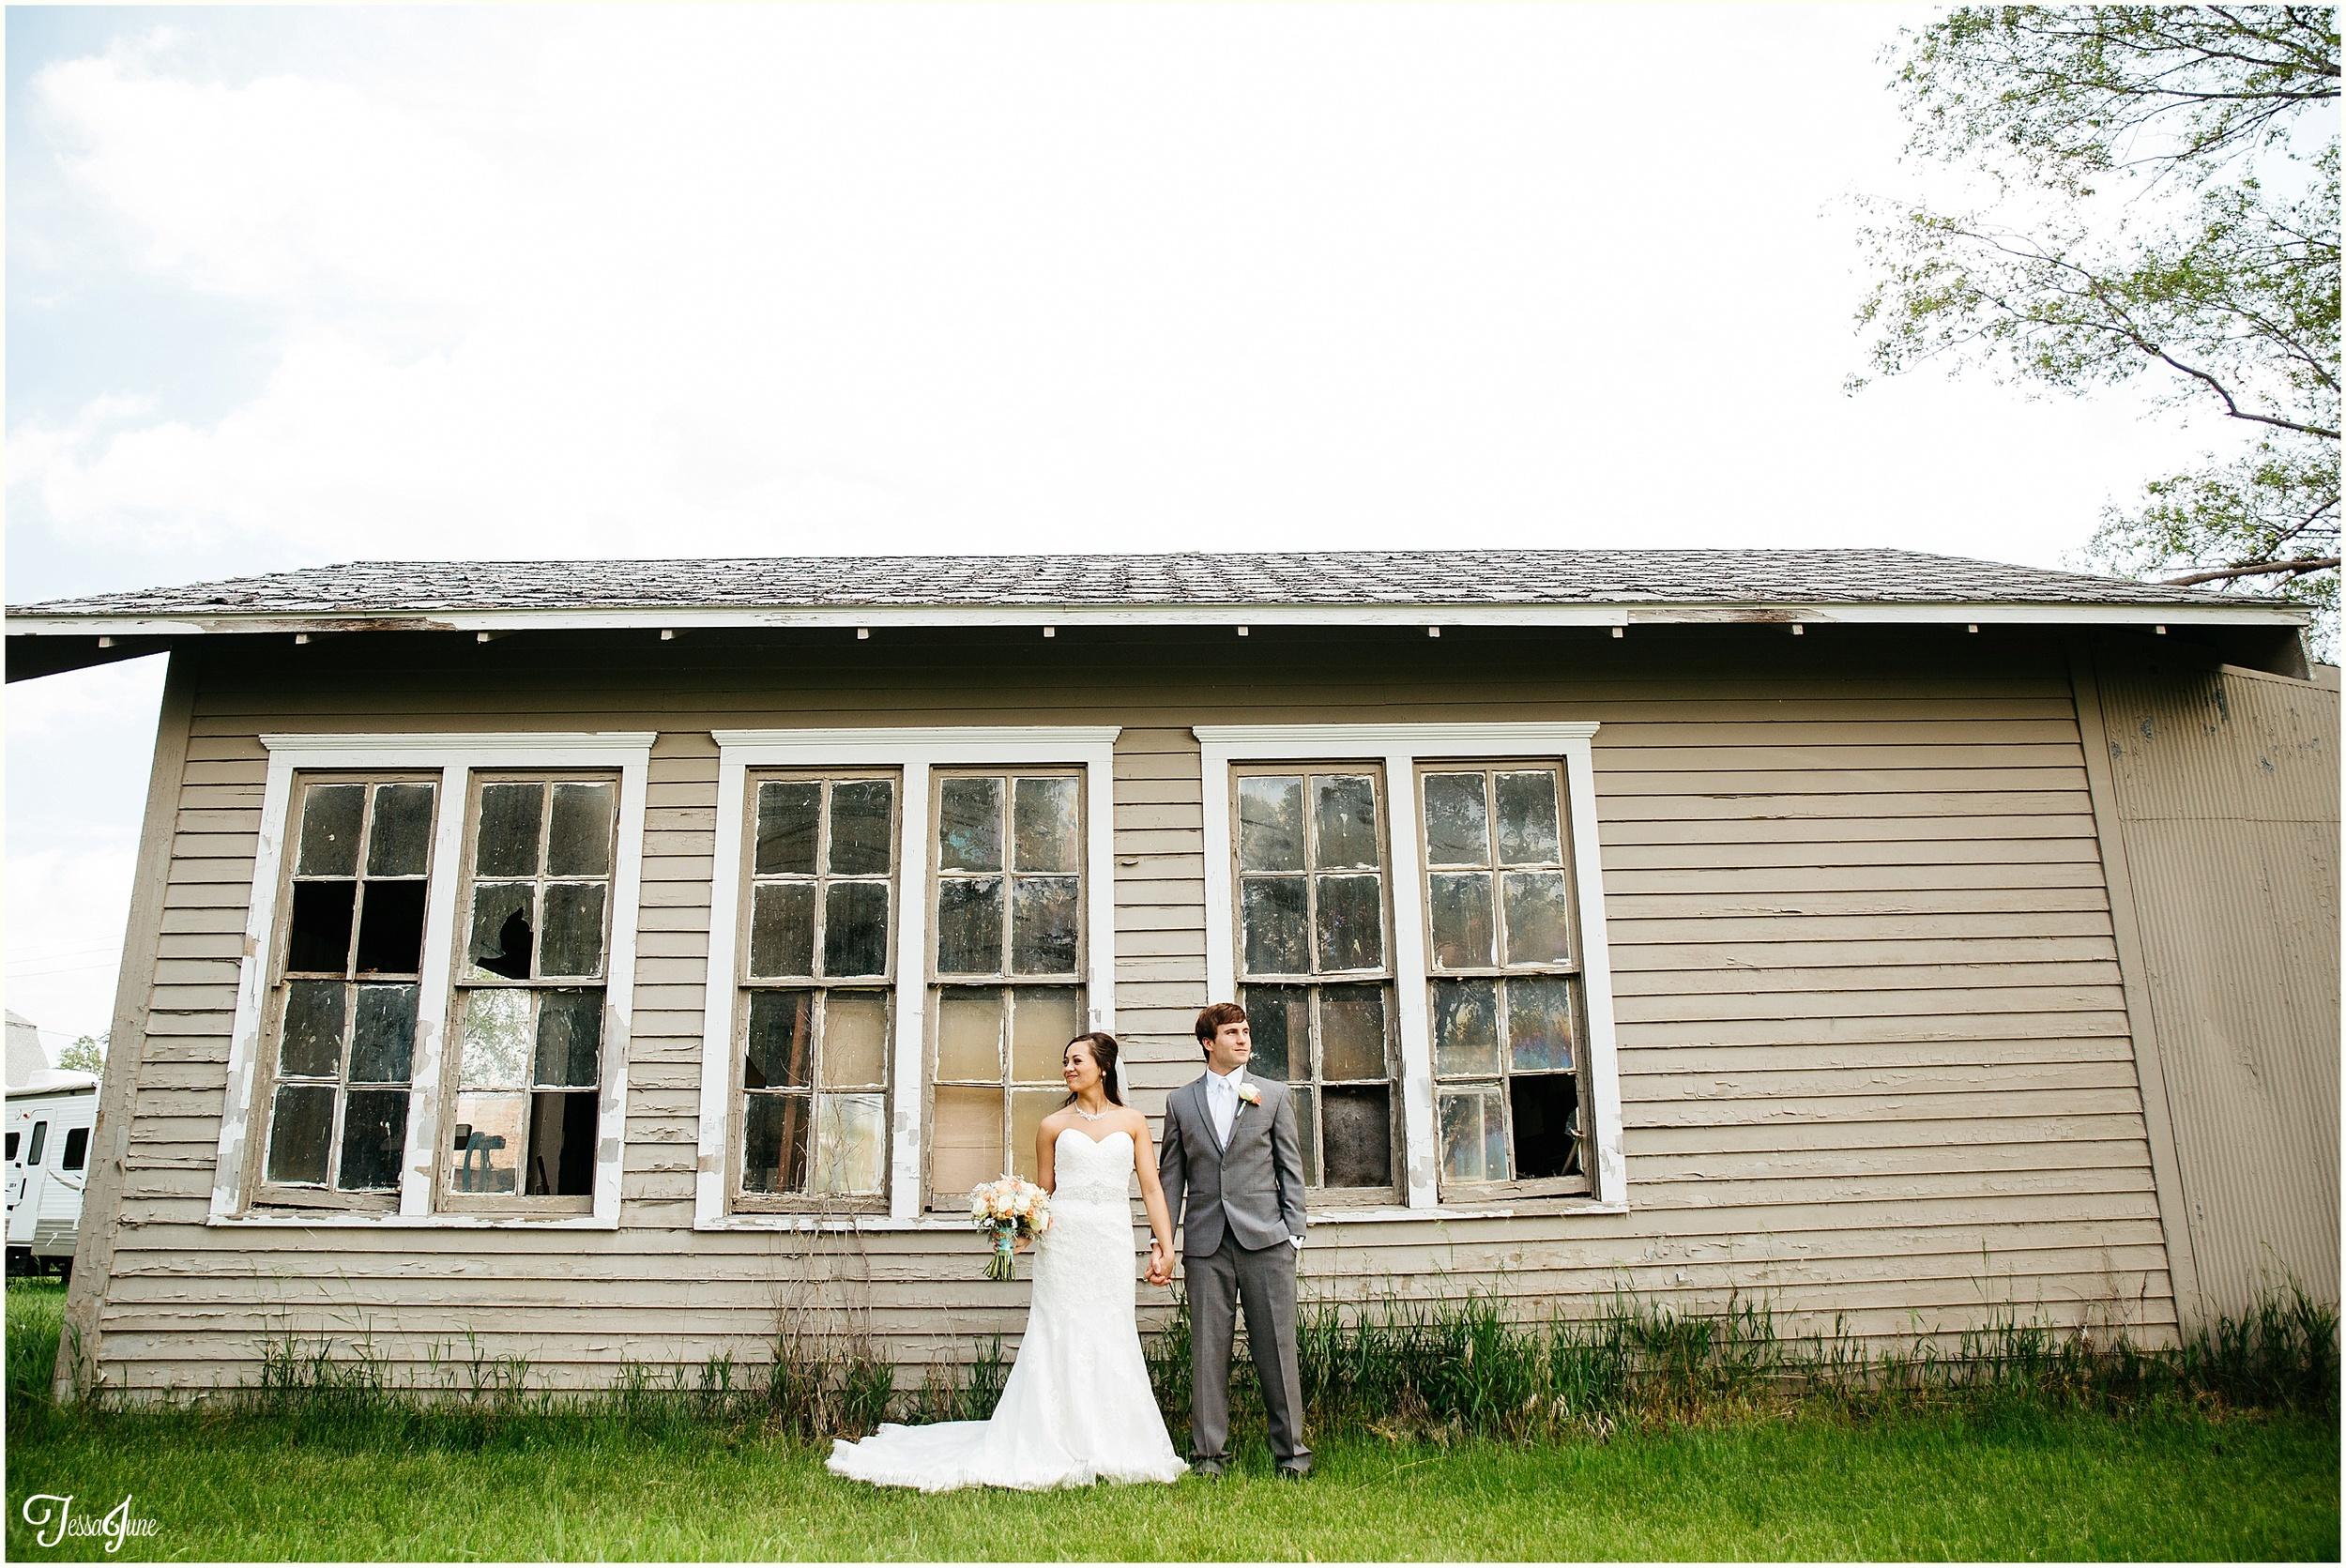 Decker-wedding-South-Dakota-Teal-Blue